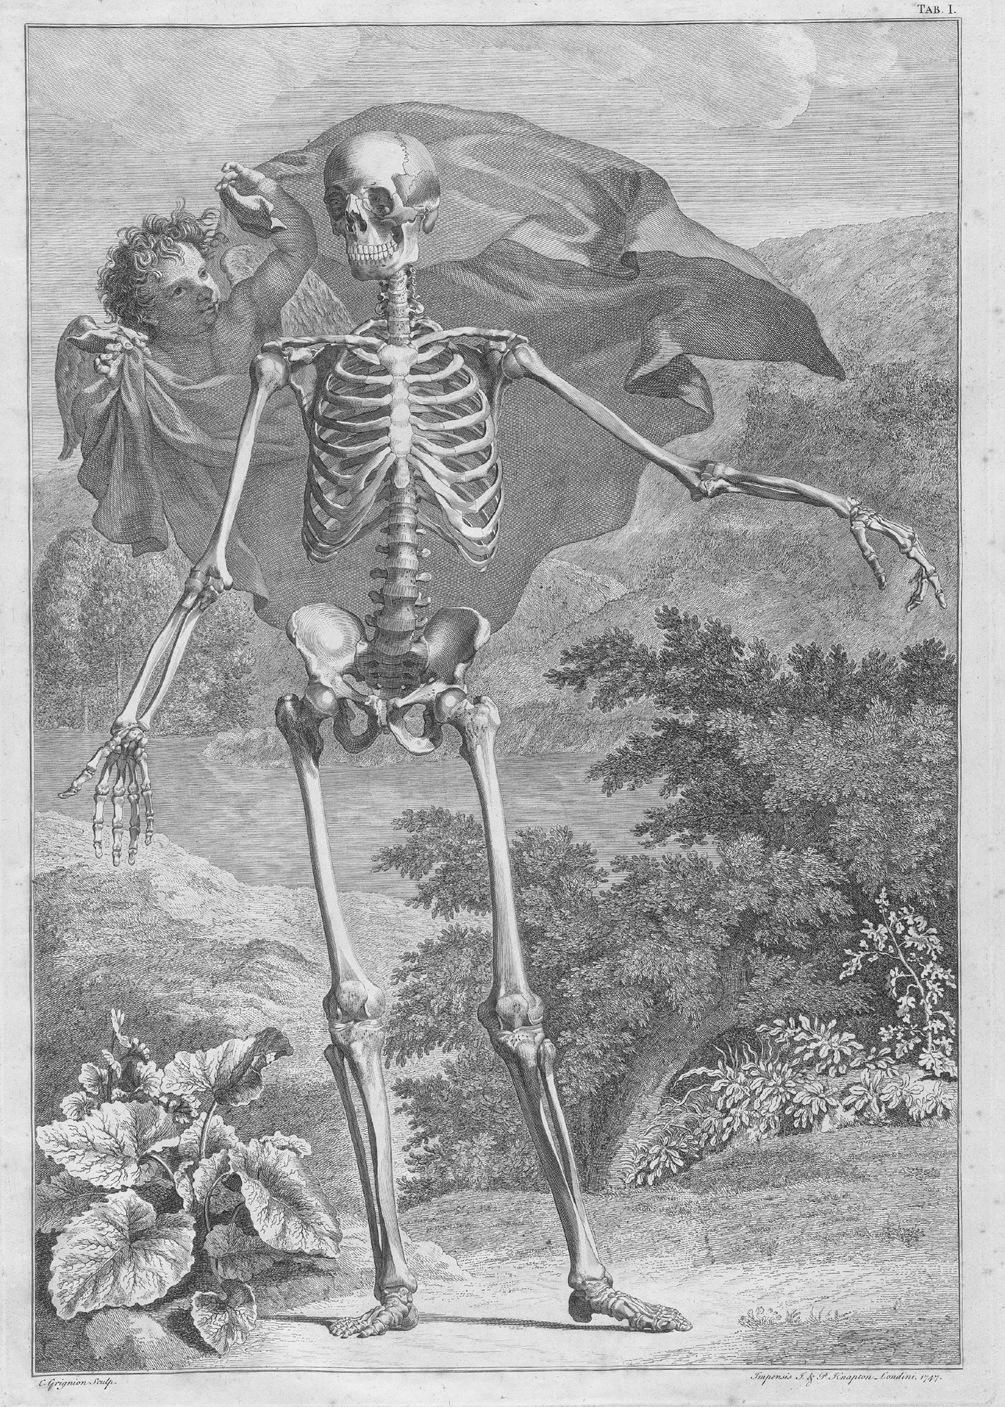 Drawn sleleton angel UT Engraving of Siegfried with